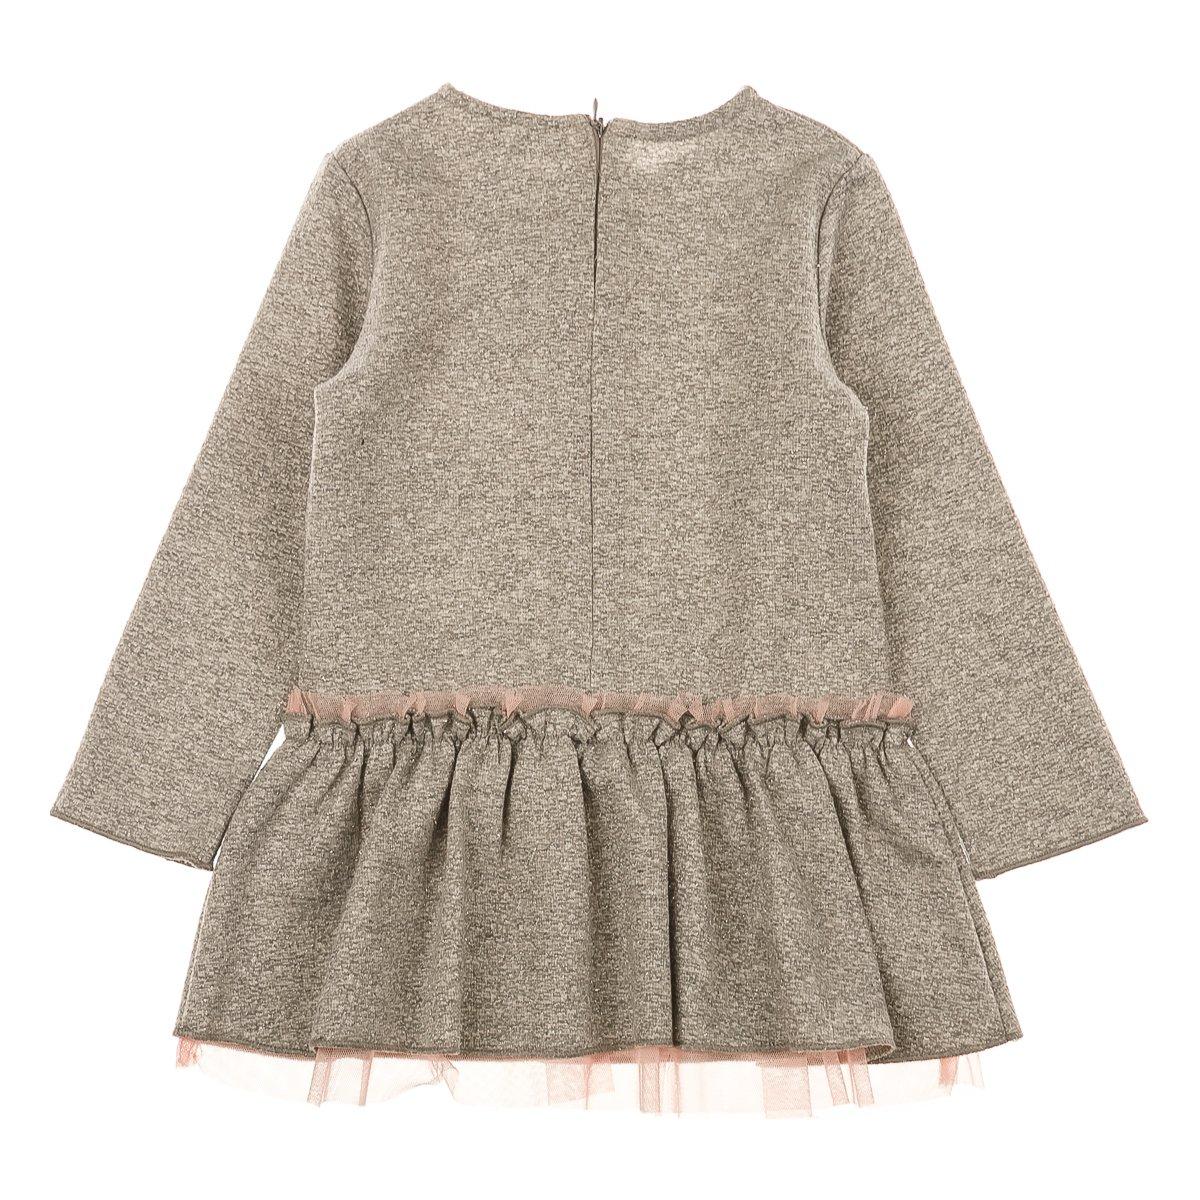 Купить Платья, сарафаны, юбки, Платье BluKids Love&Flowers, р. 80 5479458 ТМ: BluKids, серый